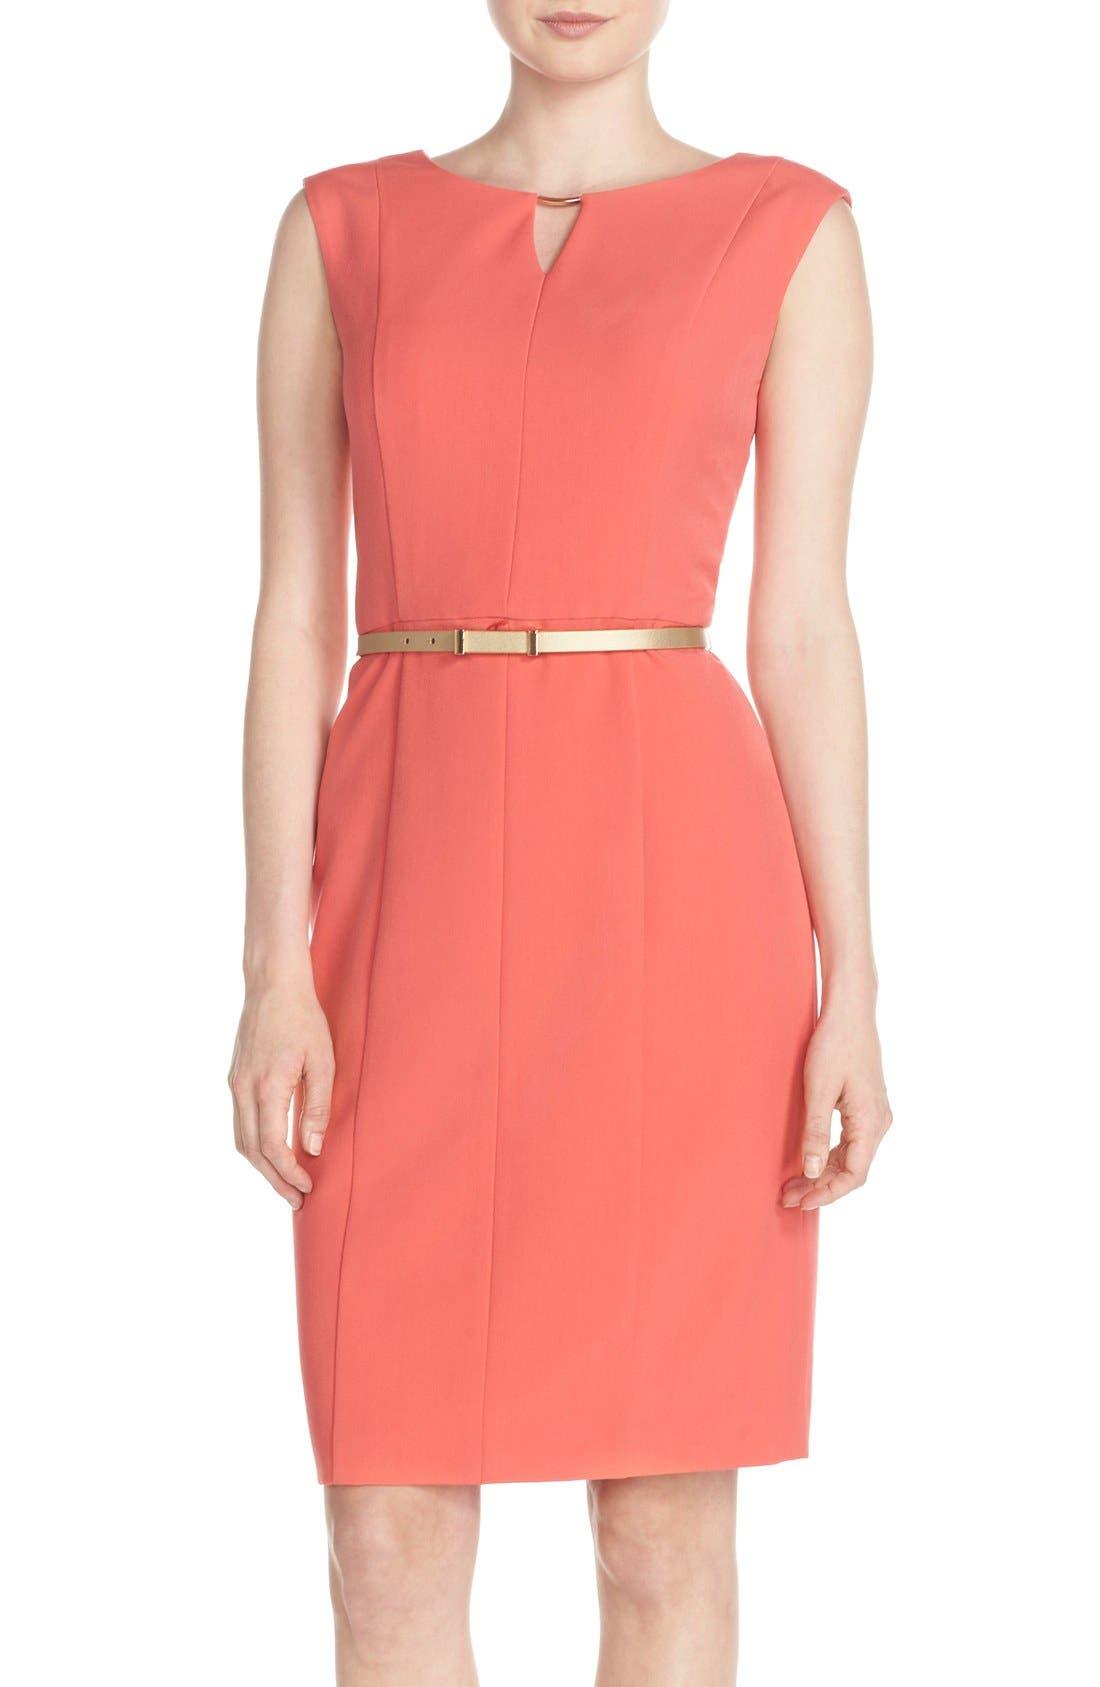 Alternate Image 1 Selected - Ellen Tracy Belted Sheath Dress (Regular & Petite)